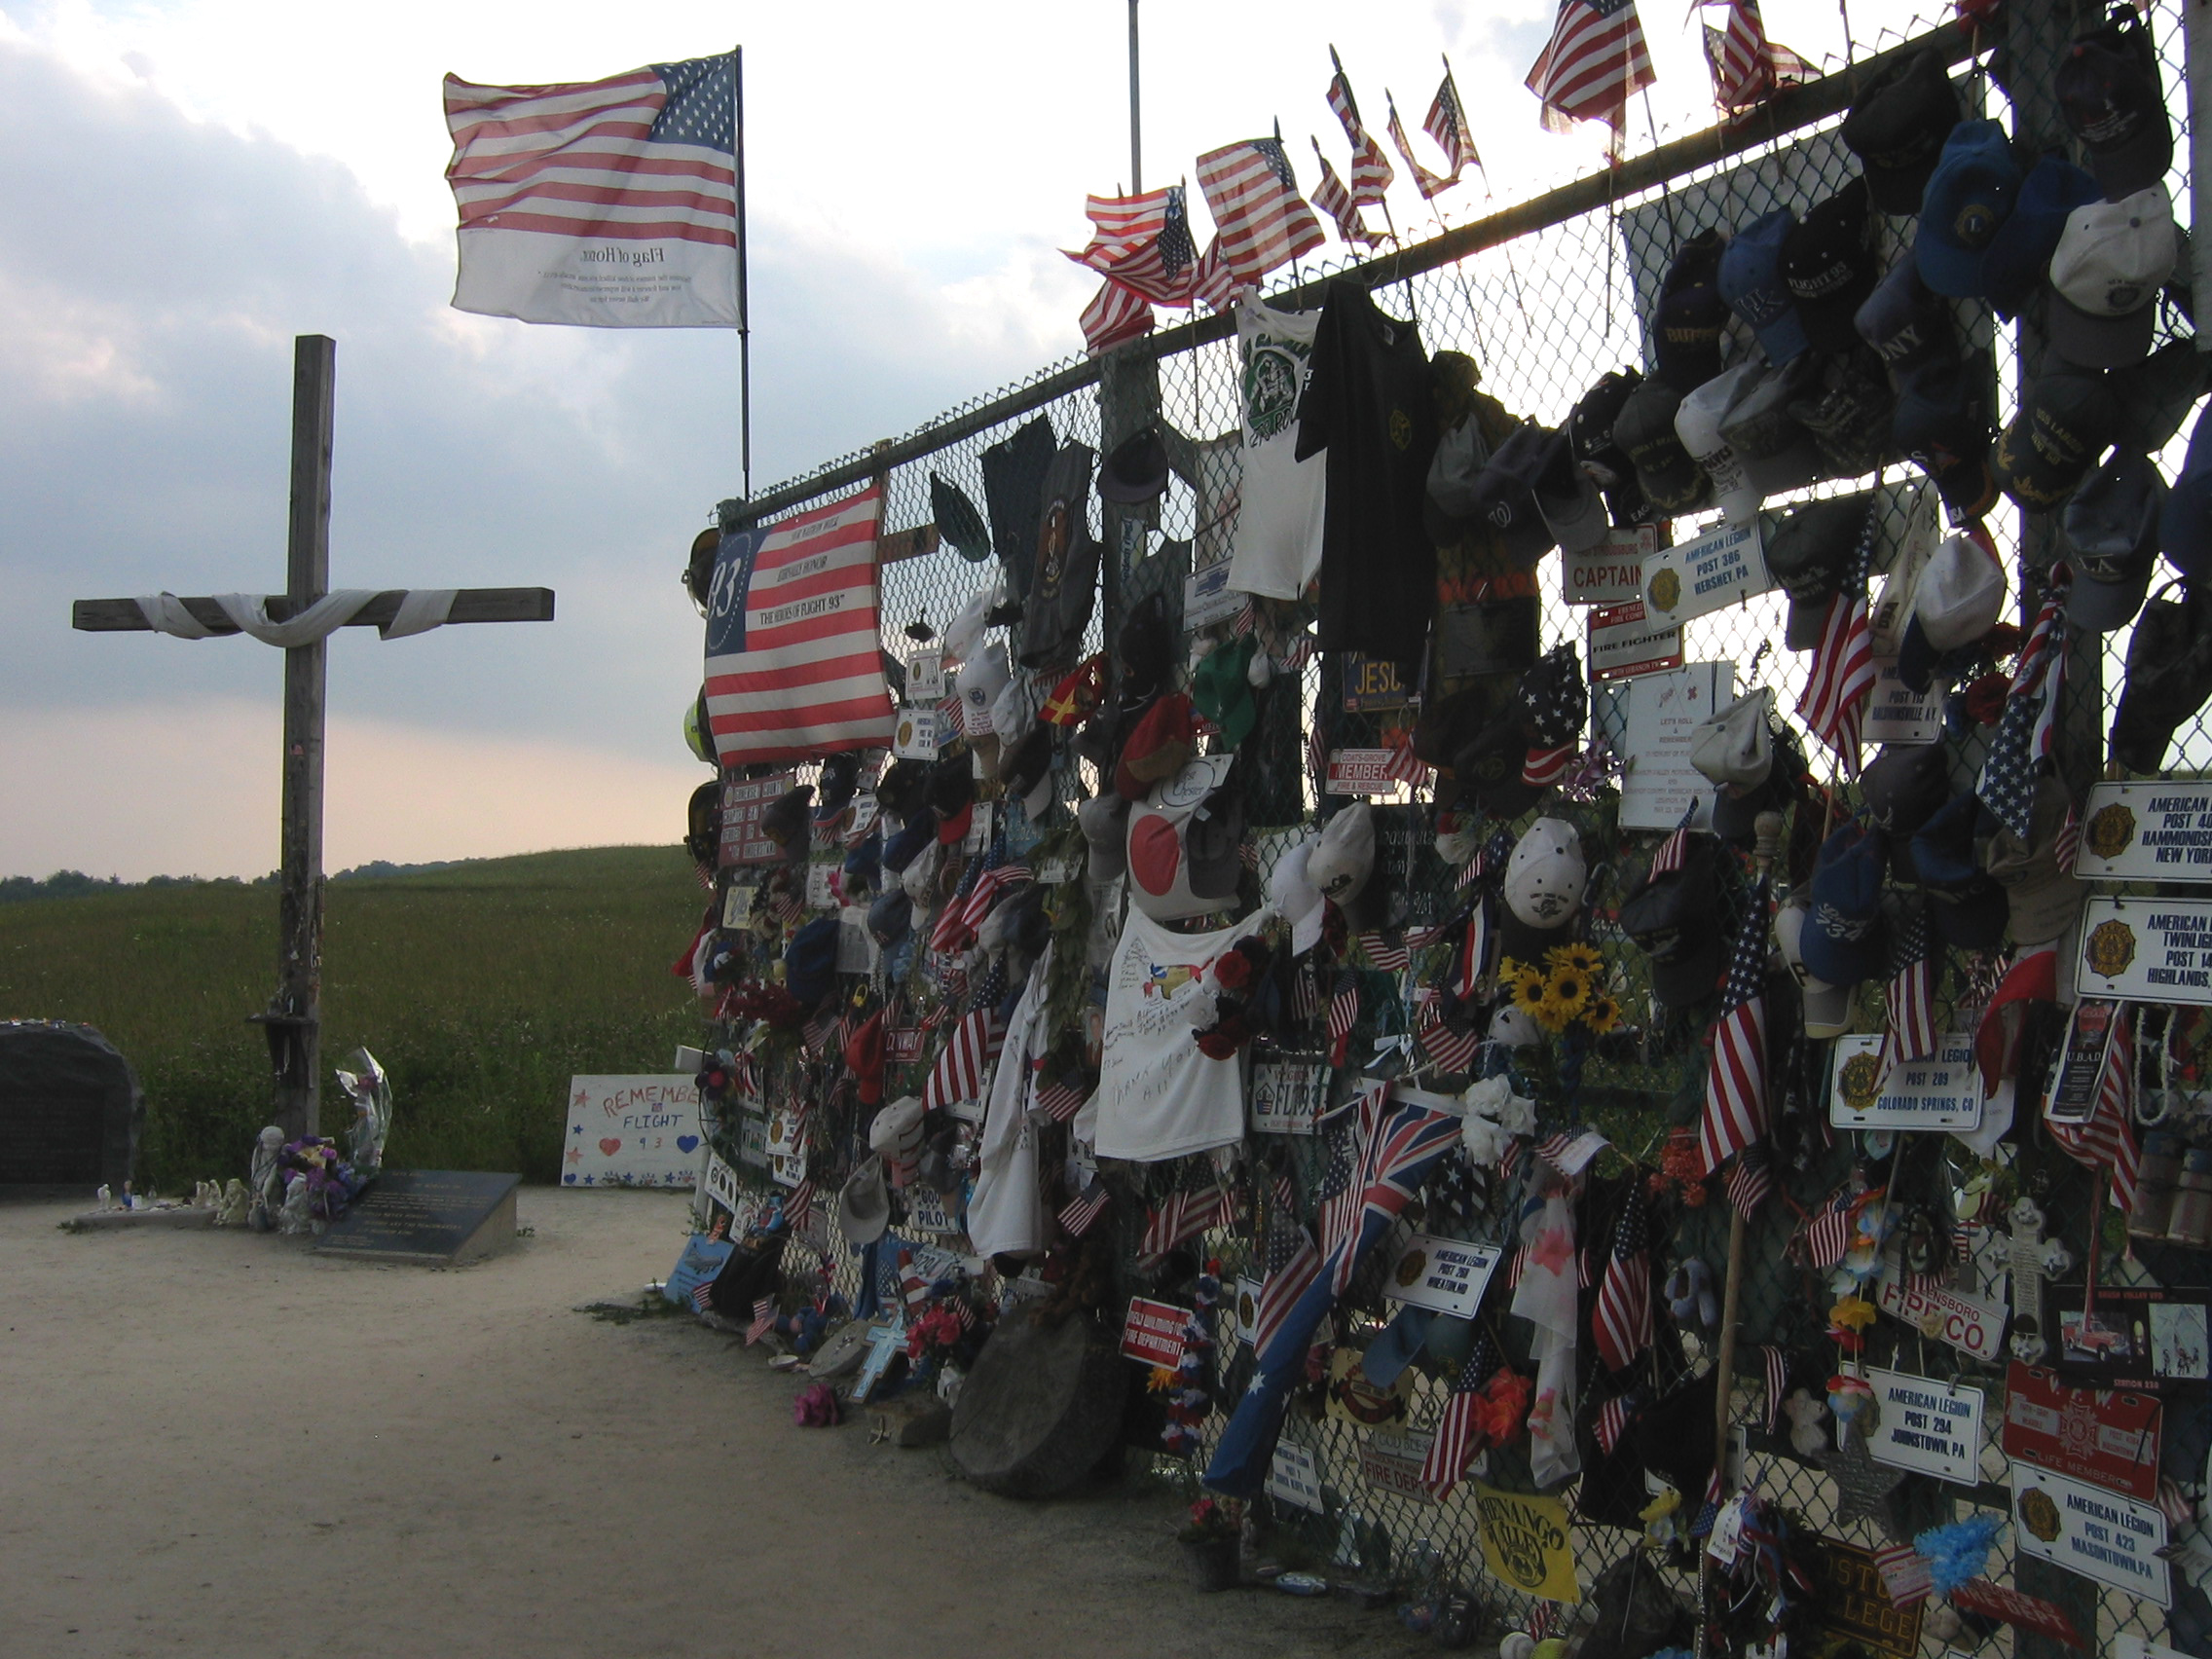 Flight 93 National Memorial i Somerset County, Pennsylvania foto: Aude / CC BY-SA